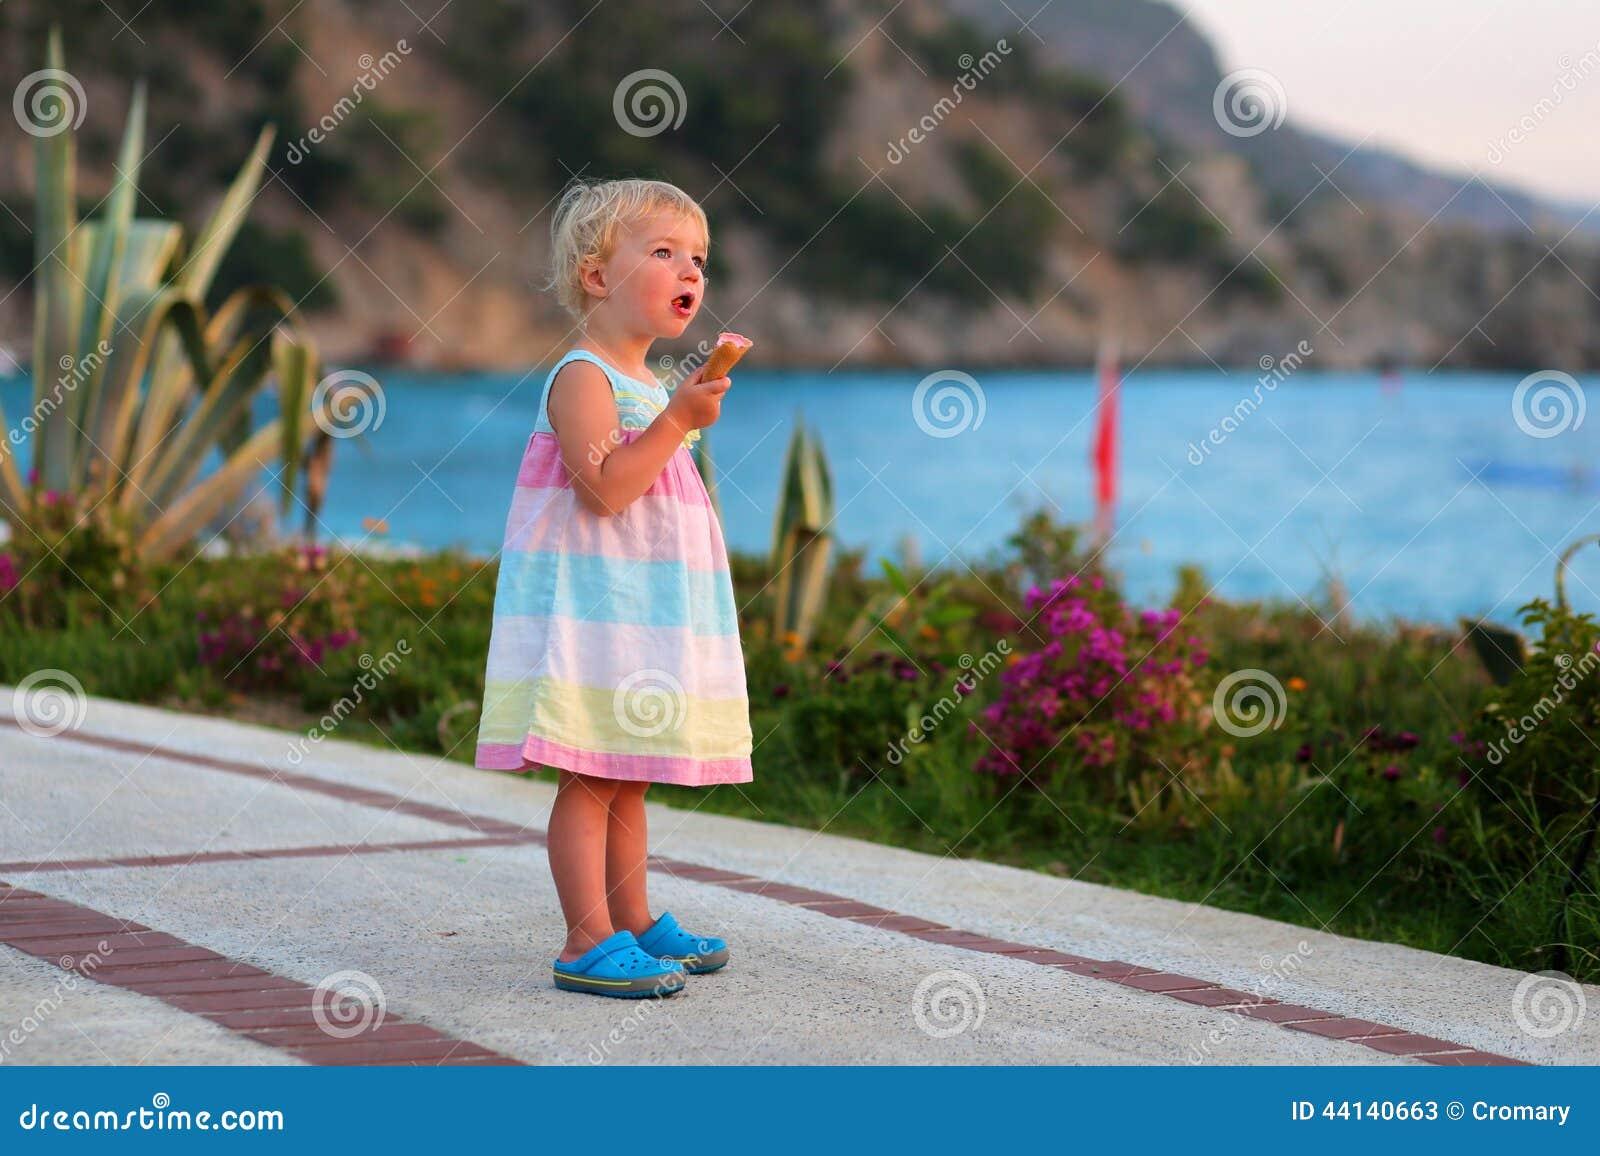 Teen Boy Eating Icecream At The Beach Stock Photo - Image